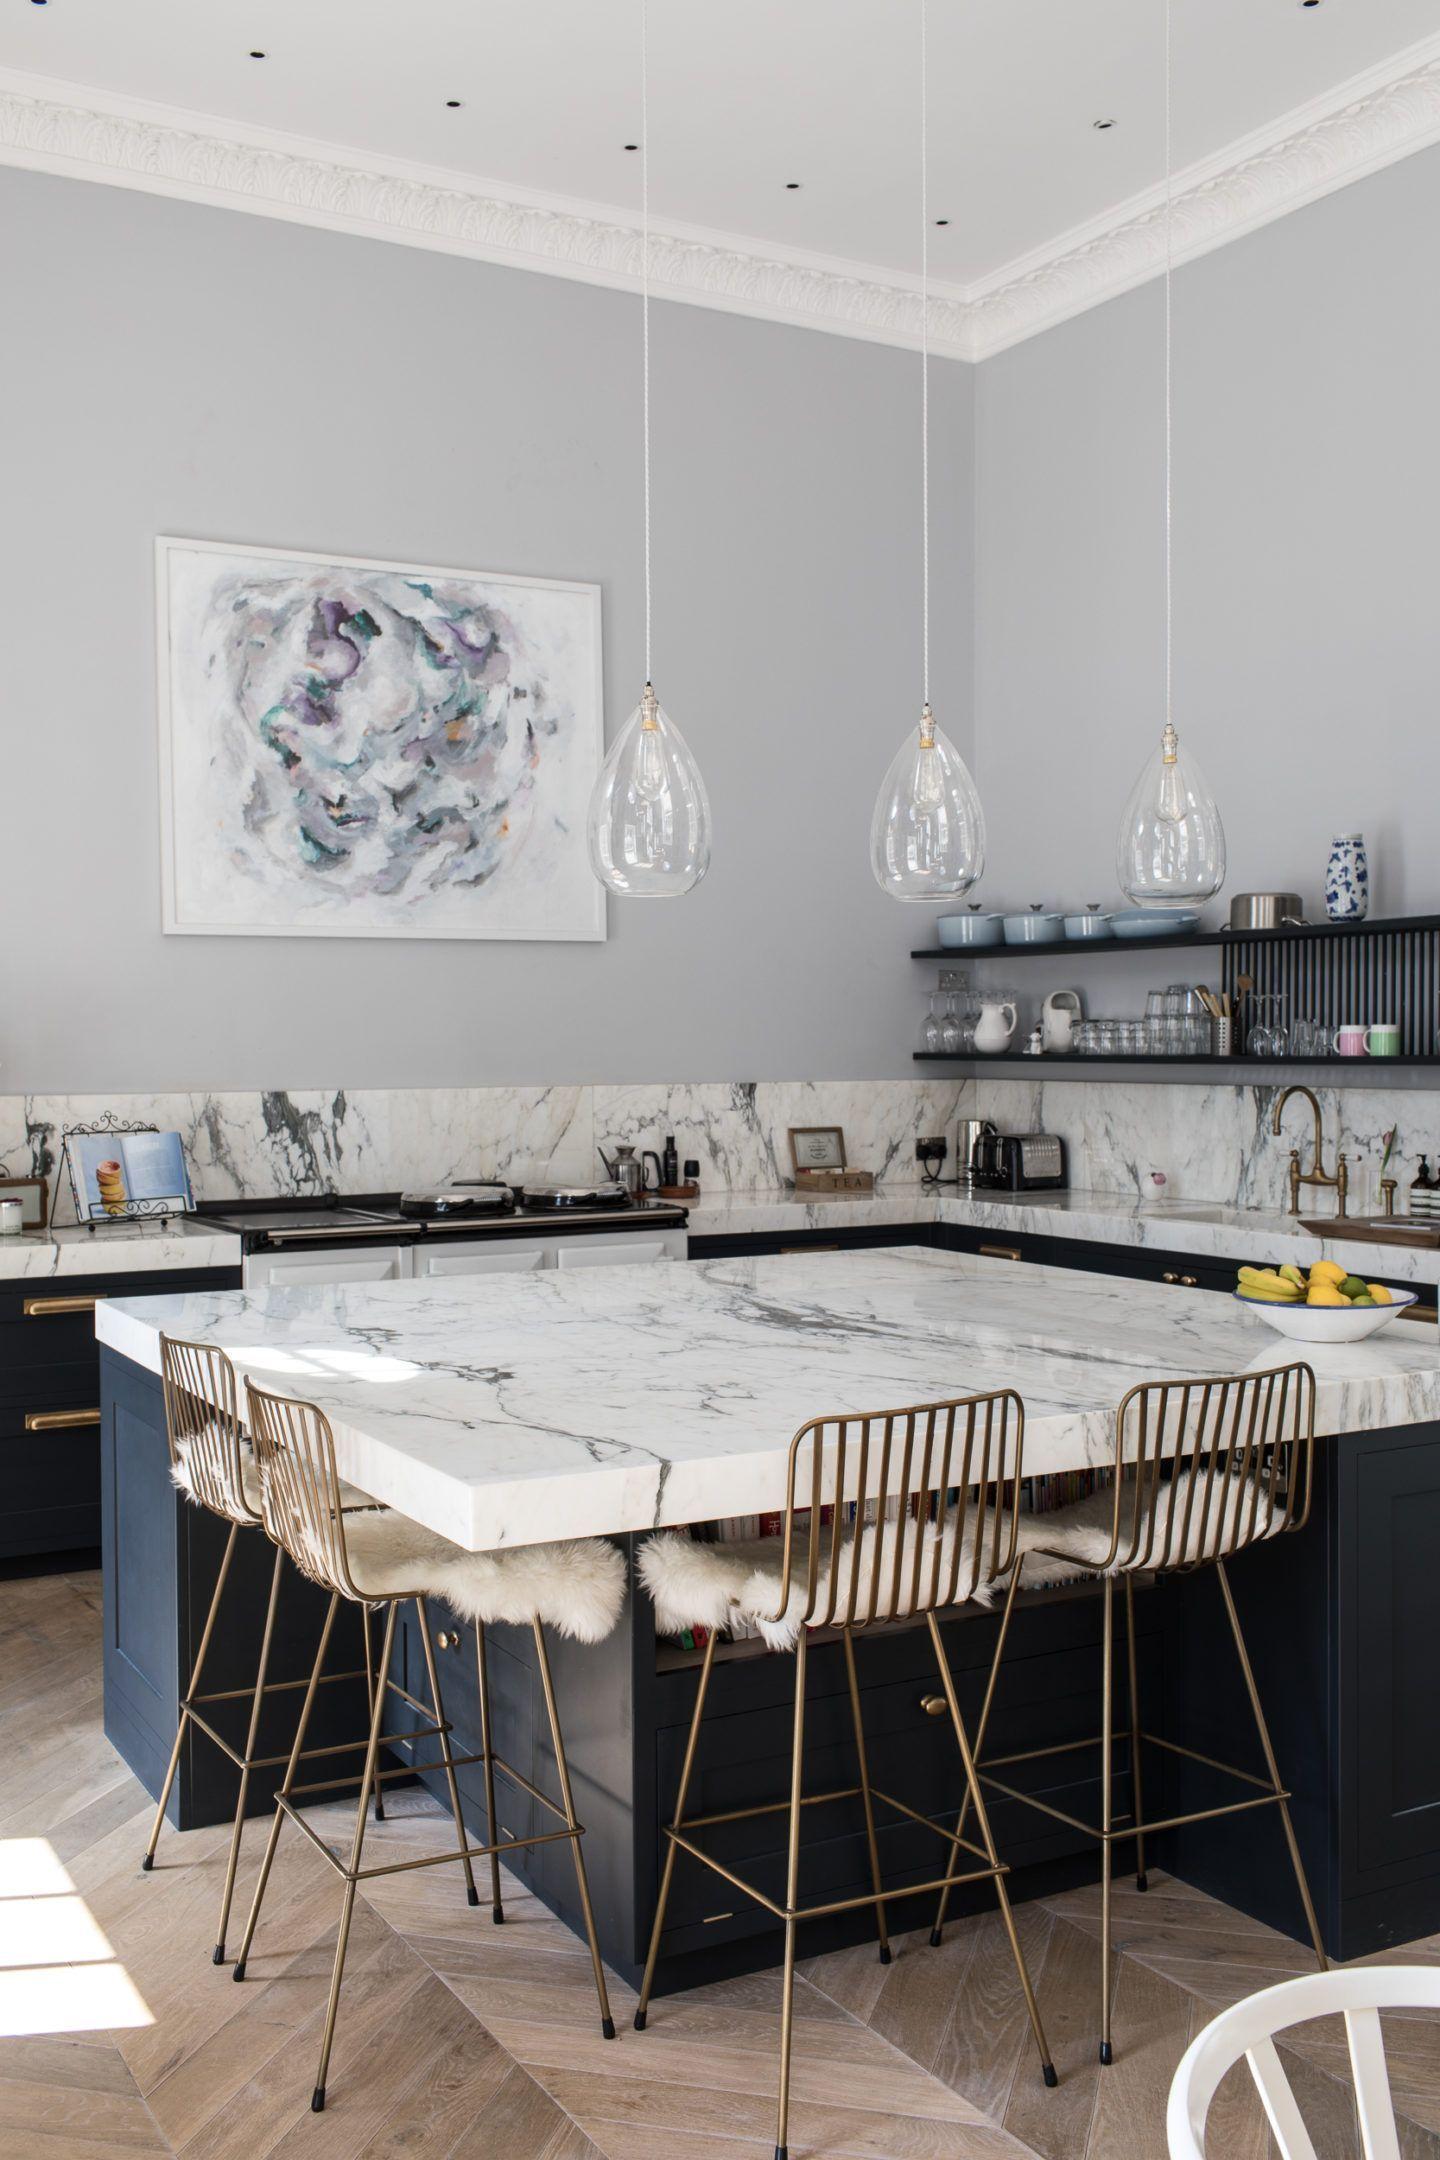 Küchendesign marmor marble kitchen island  brass chairs  sheepskins  airy pendants